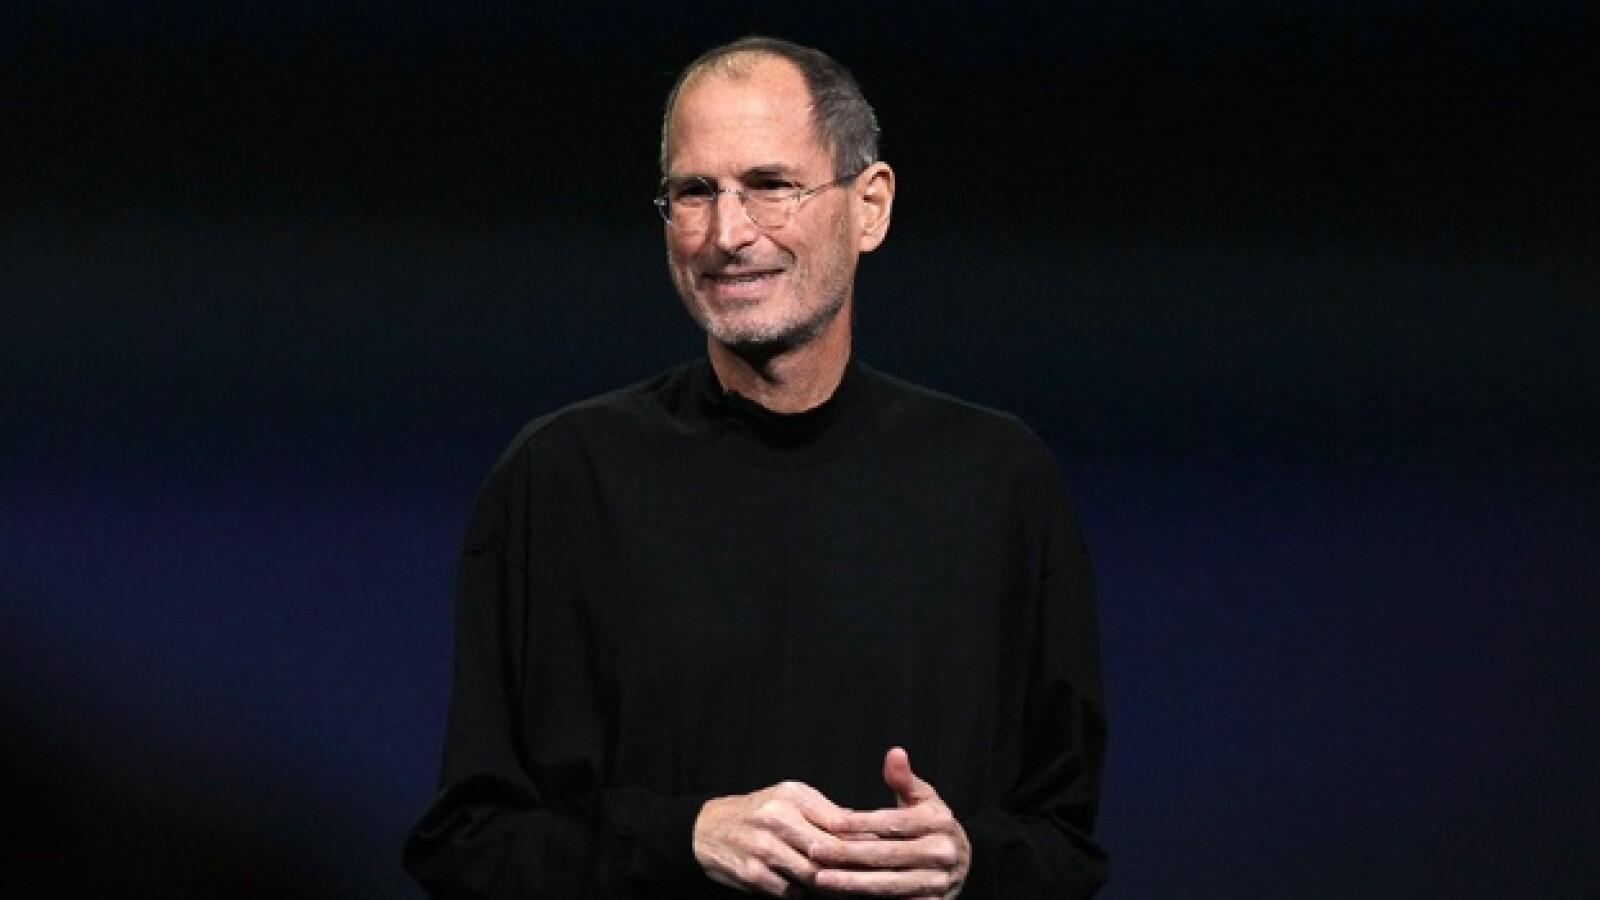 steve jobs apple lanzamiento ipad2 02 marzo 2011